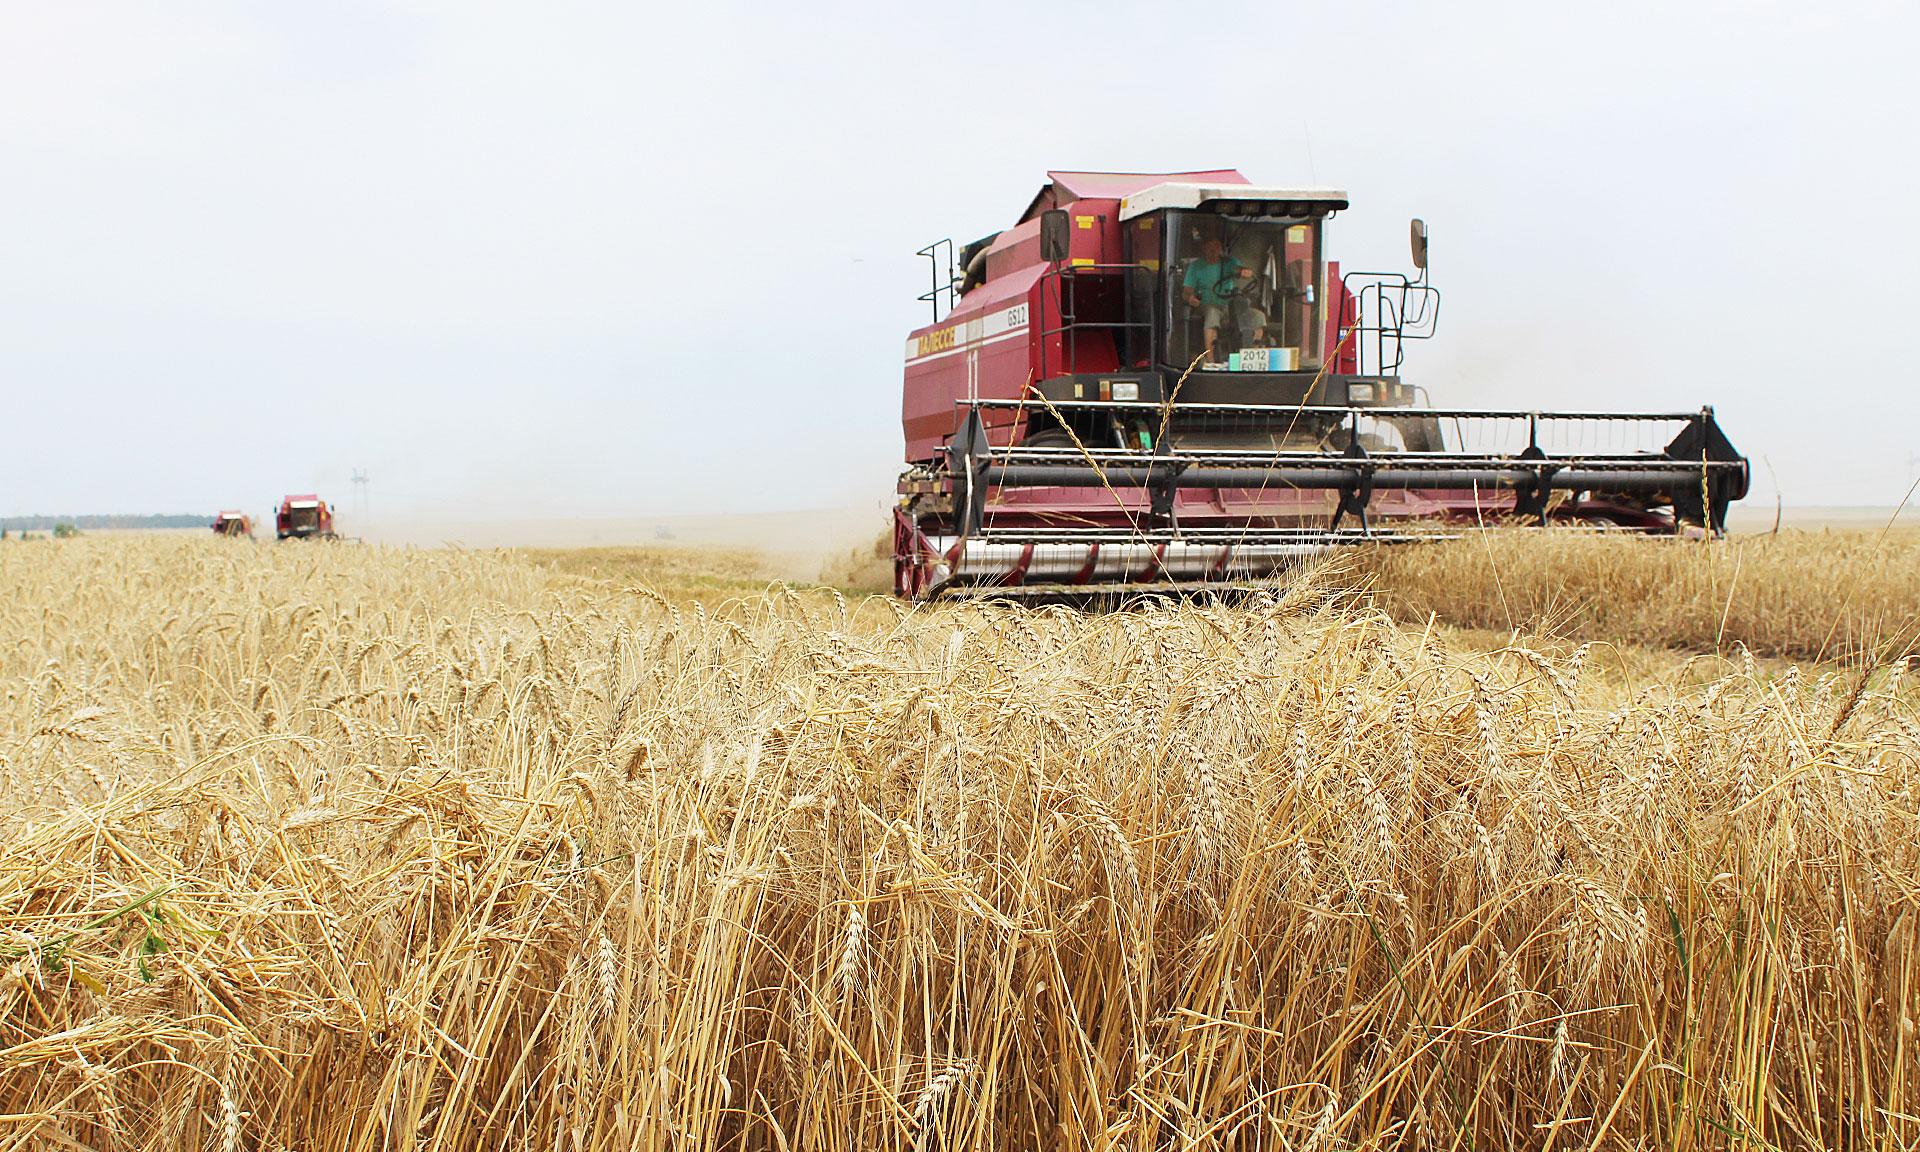 Казахстан с начала уборочной кампании намолотил 4,3 млн тонн зерна